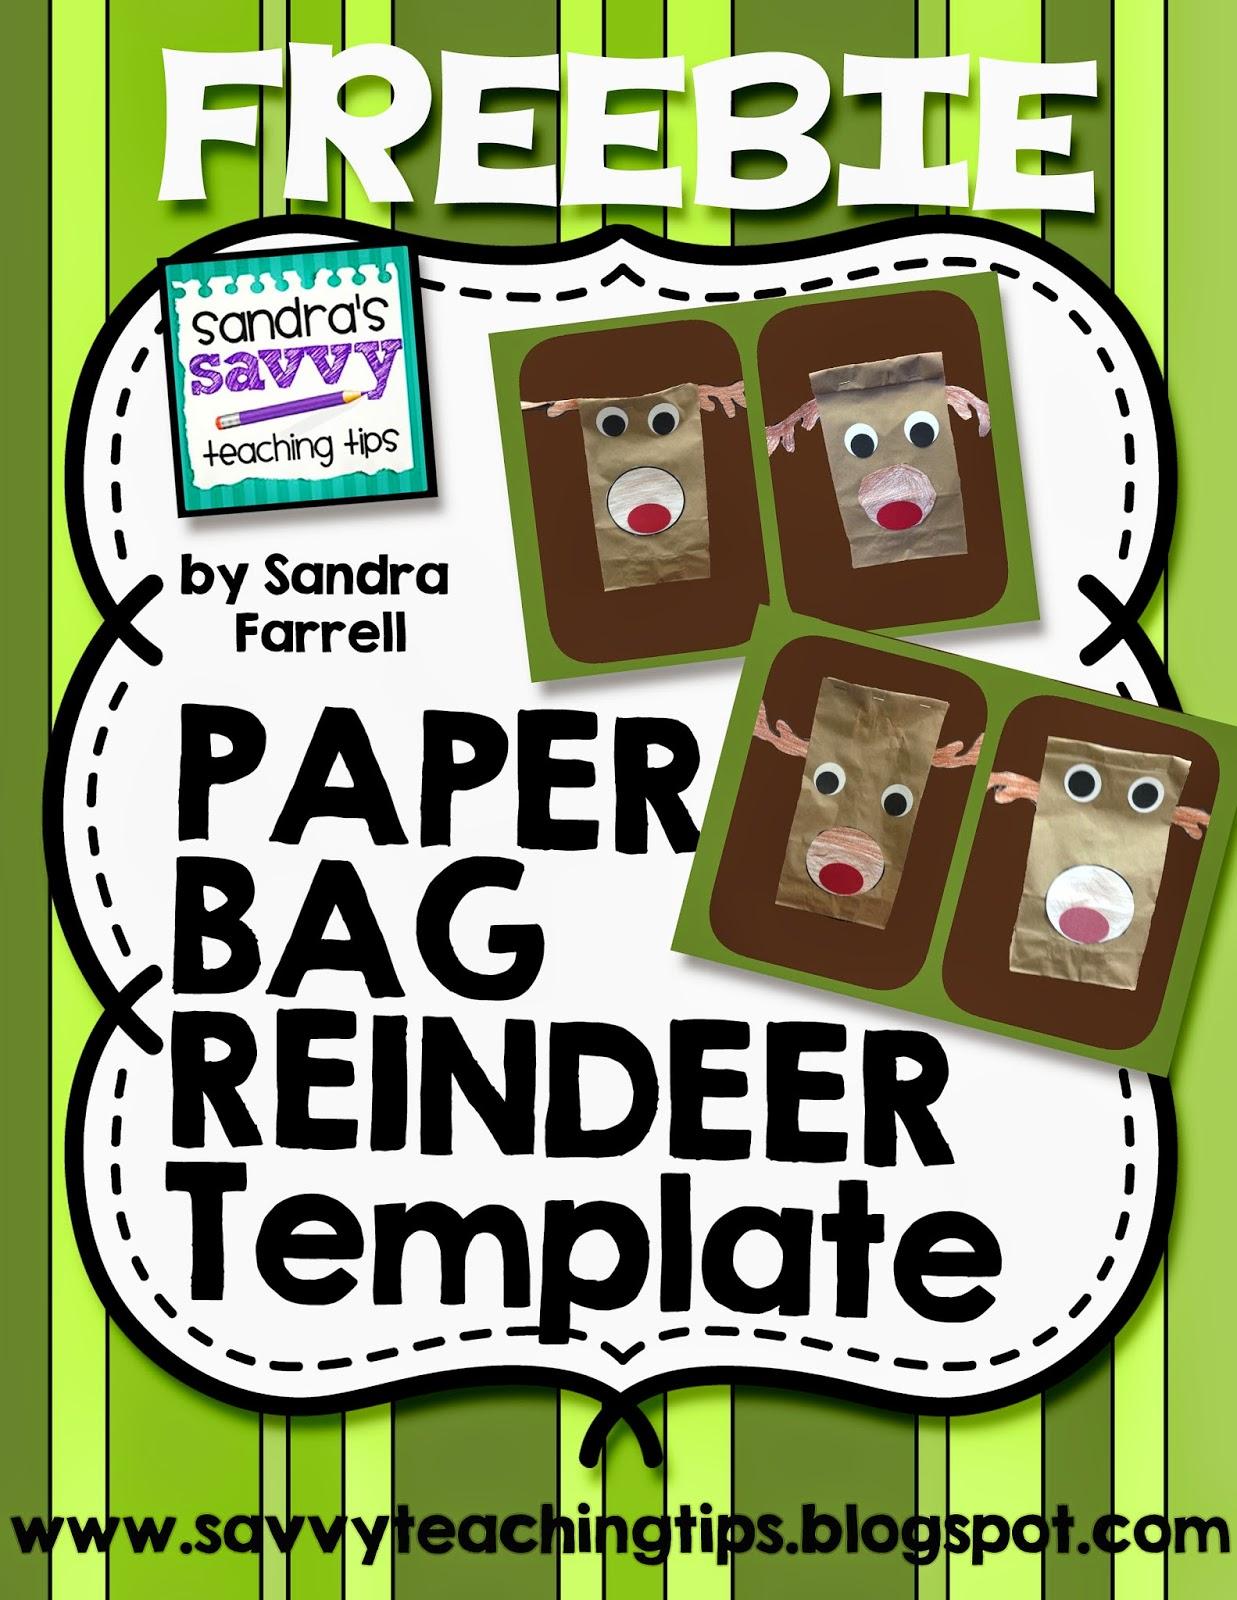 Rudolf the reindeer gift bag craft | all kids network.